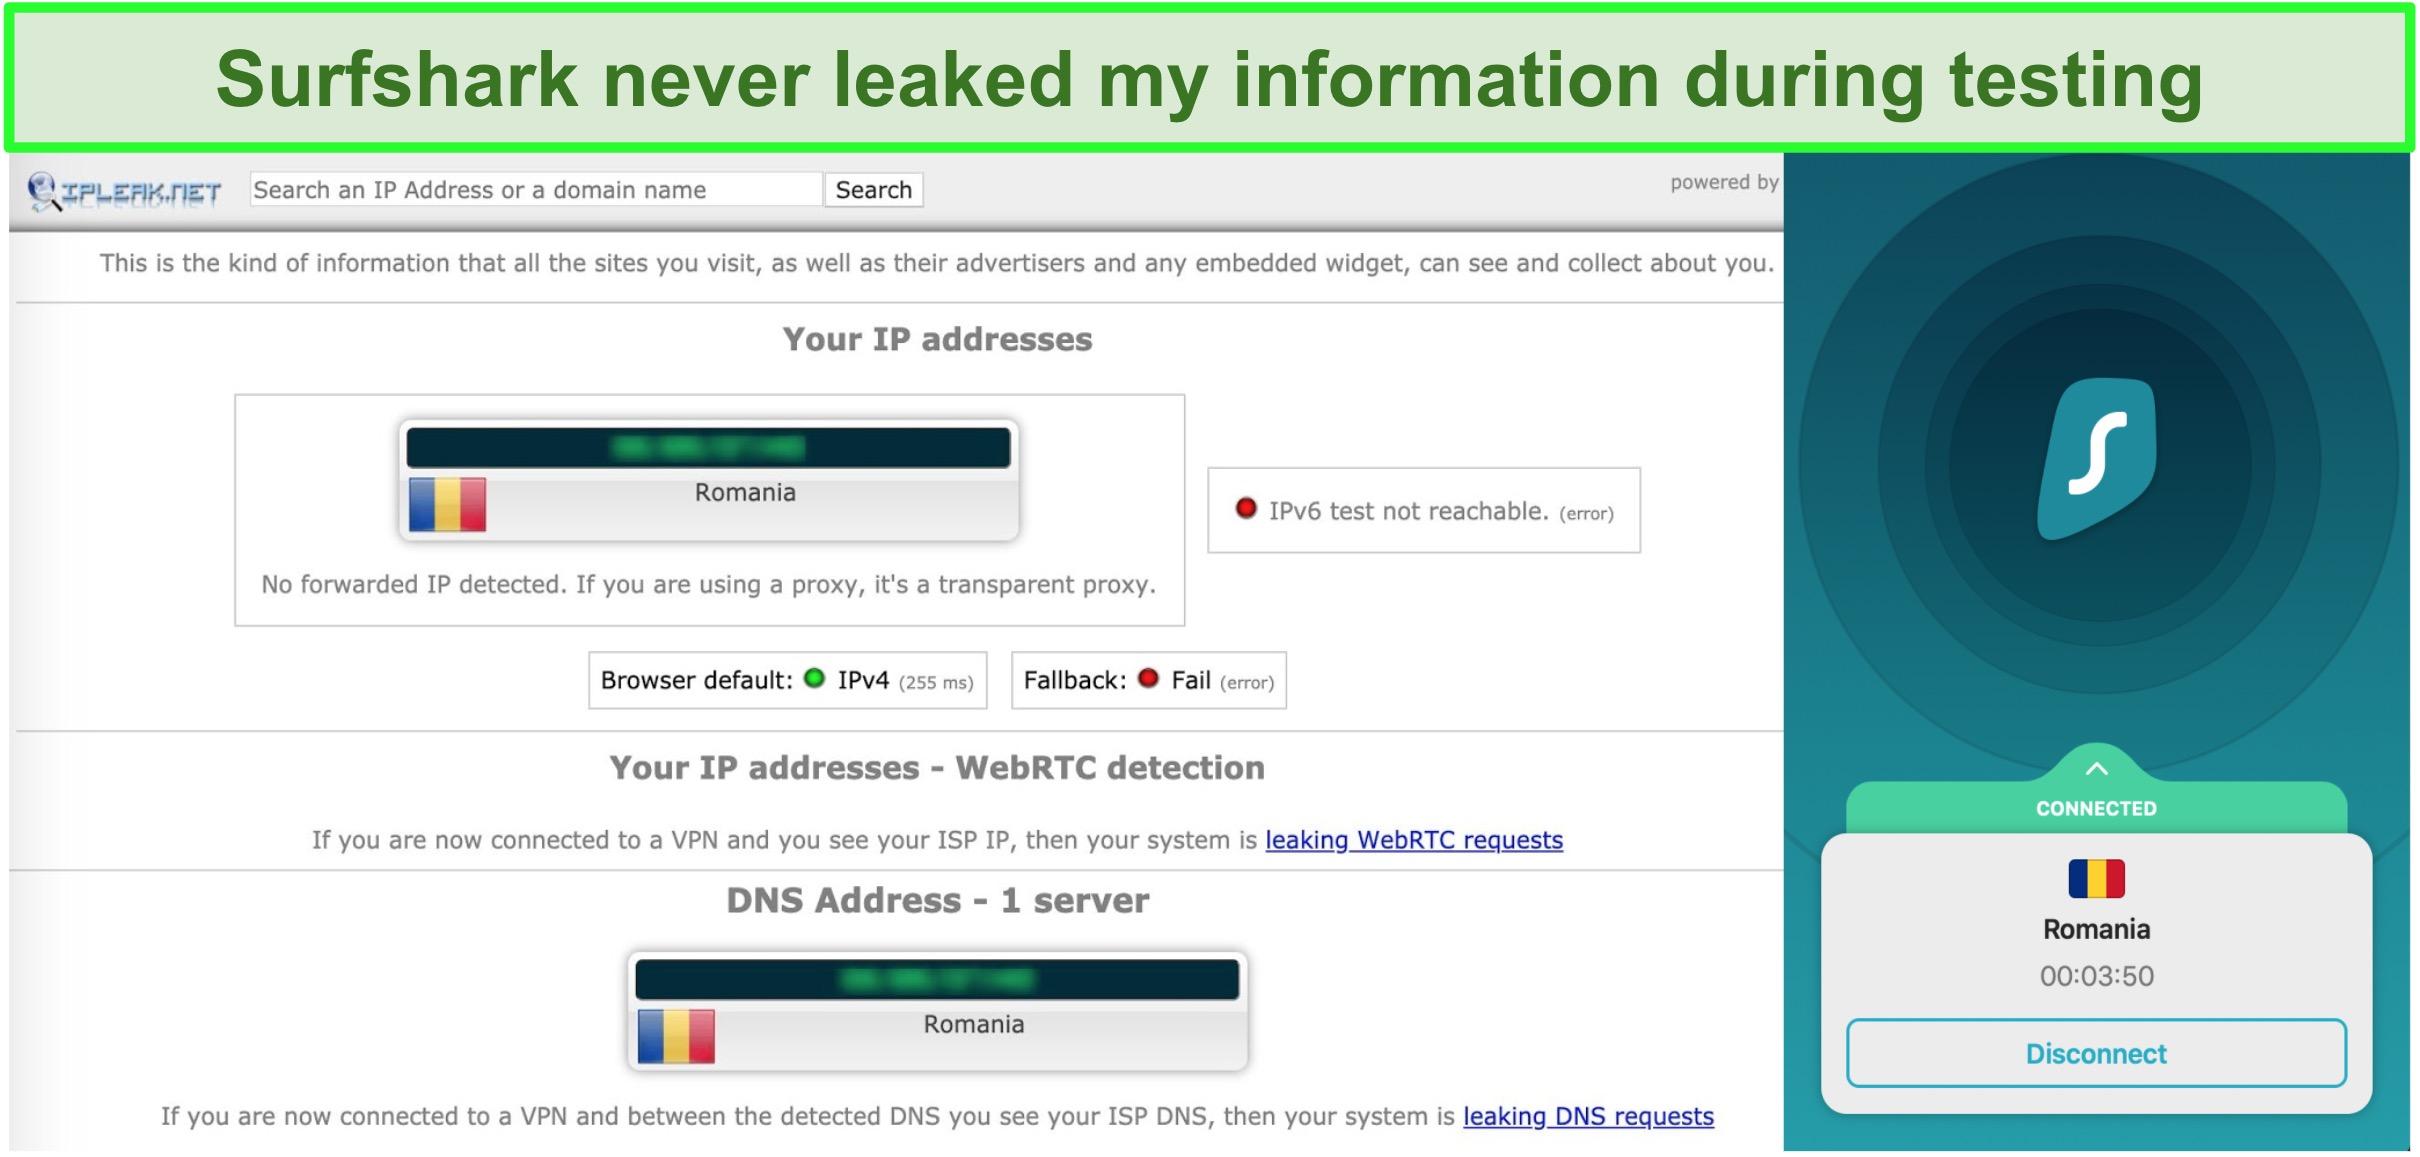 Screenshot showing Surfshark passed IP, DNS, and WebRTC leak tests